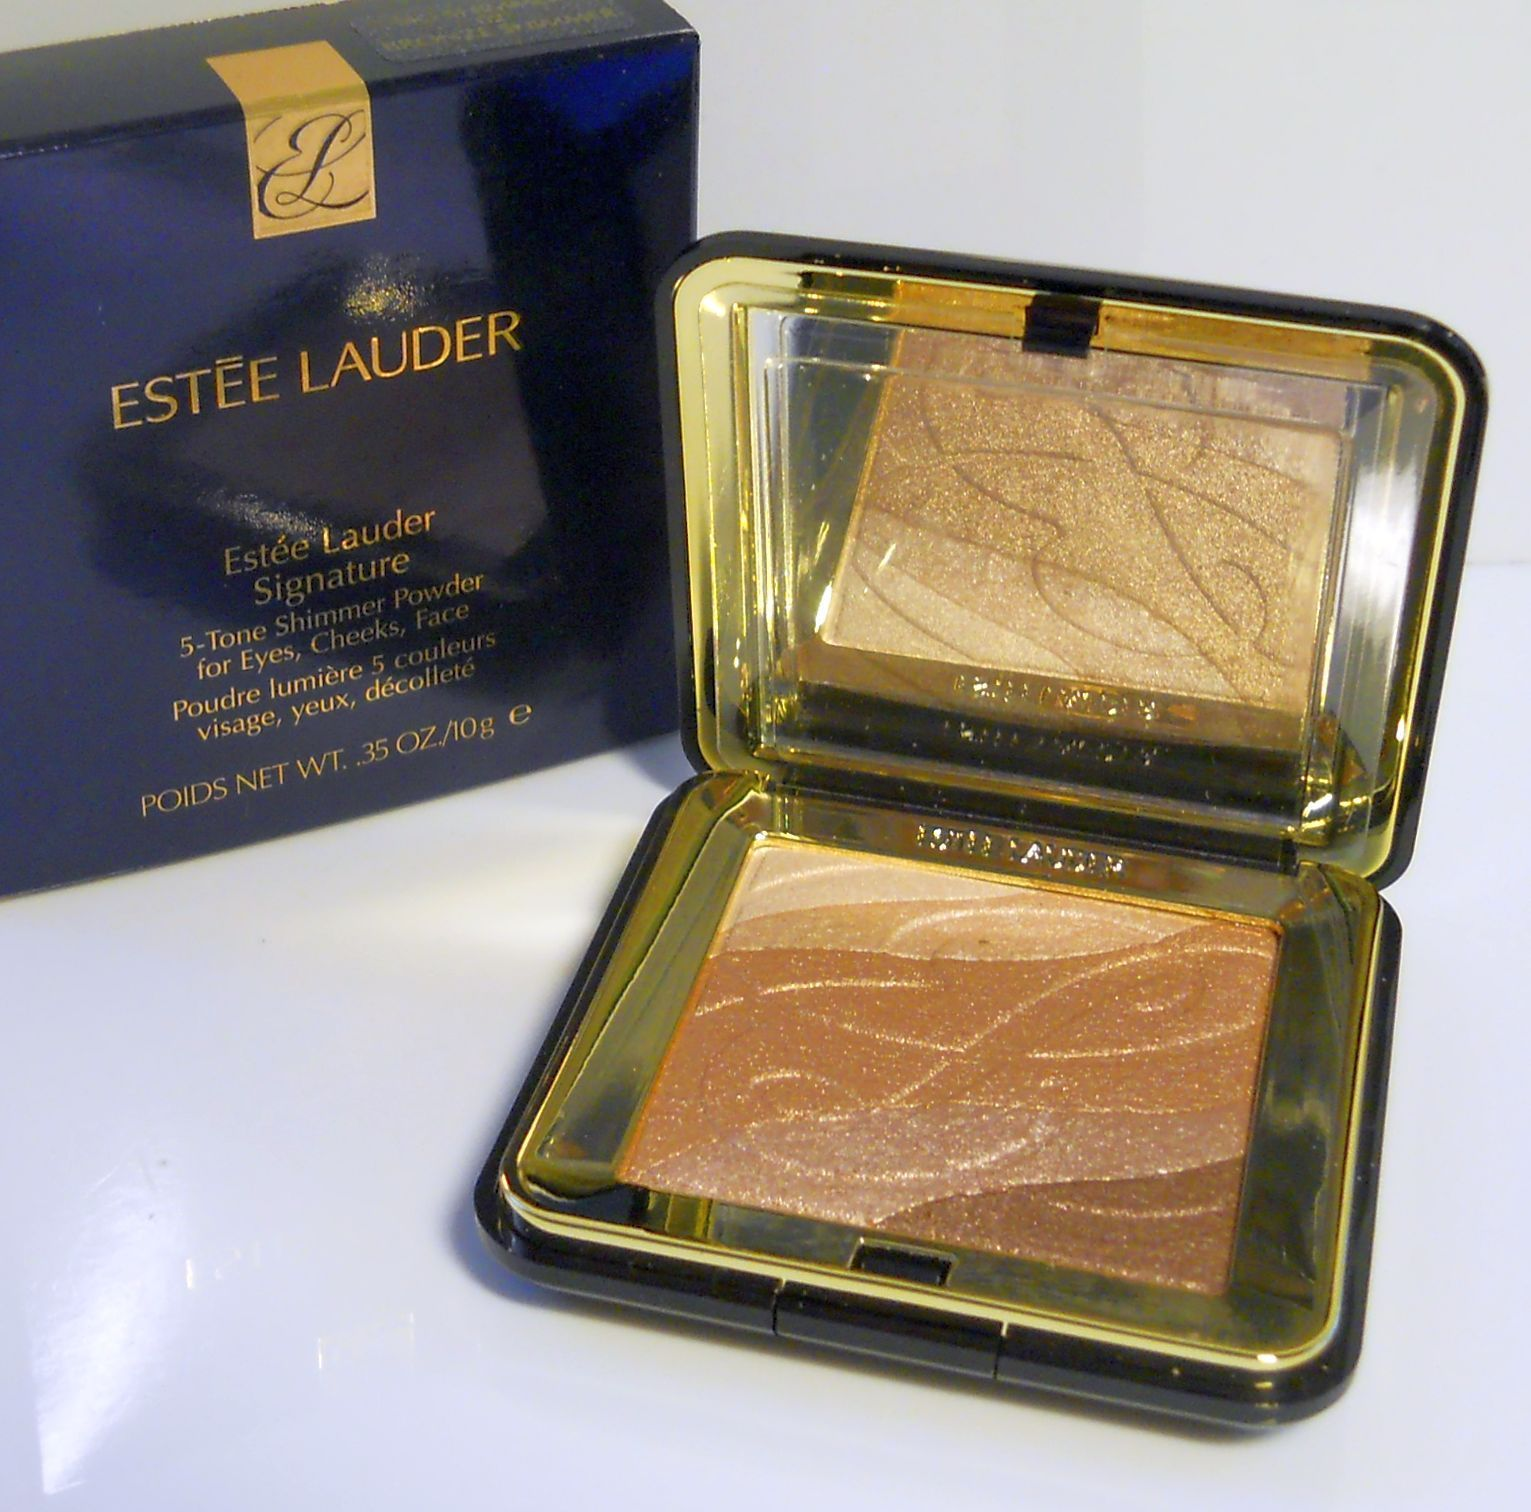 Estee Lauder - Signatur 5-Tone Shimmer Powder - 02 (Bronze Shimmer ...